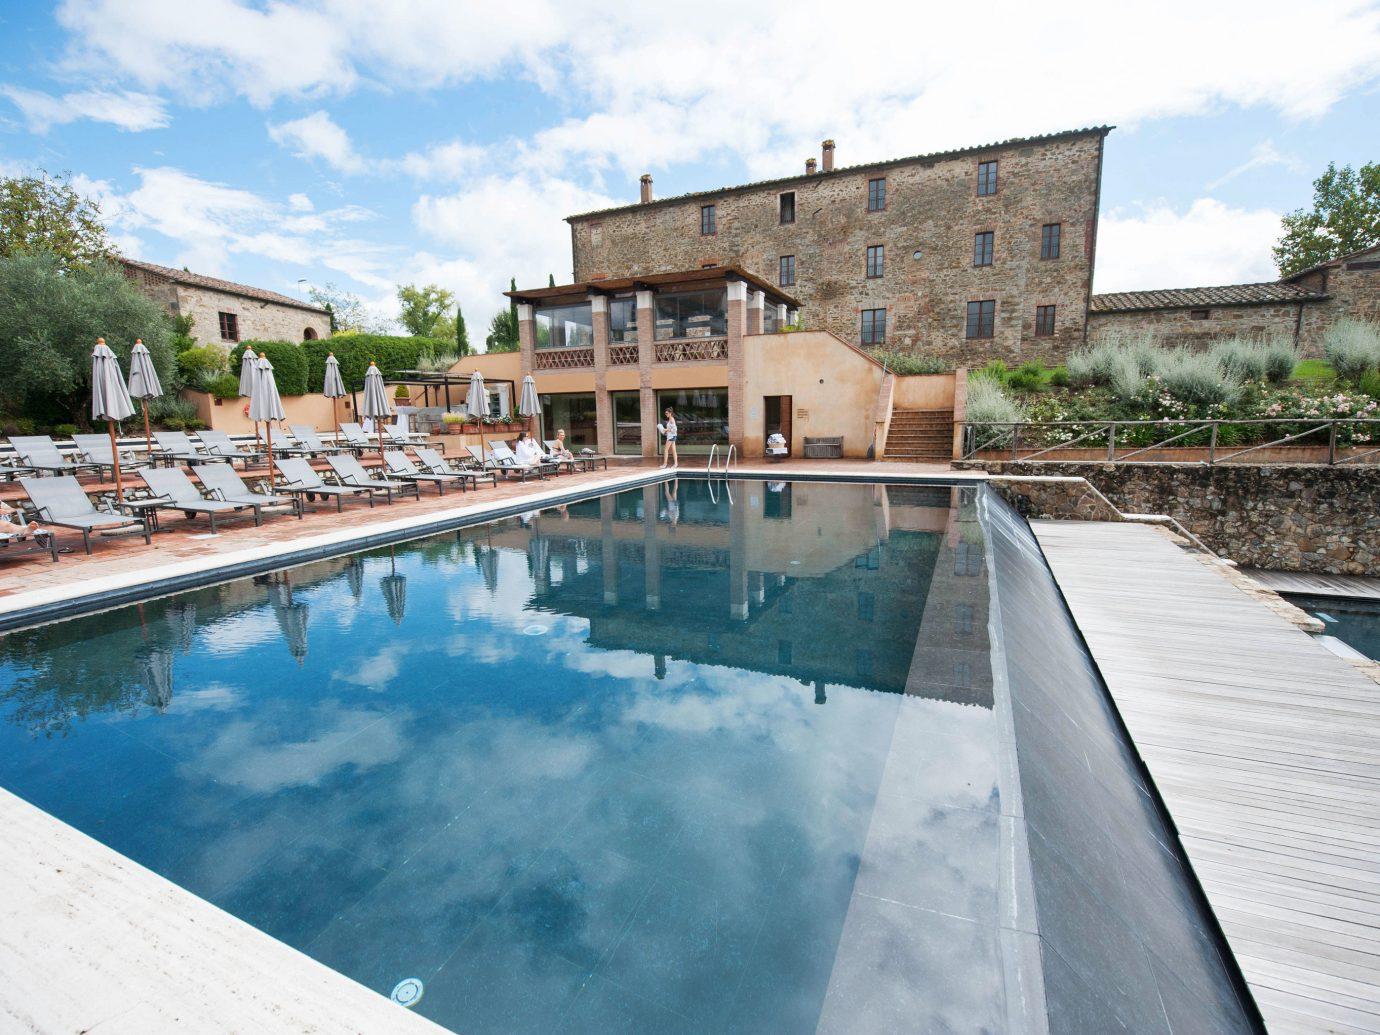 europe Hotels Italy Romance sky outdoor swimming pool property estate house vacation reflecting pool Villa backyard waterway Resort